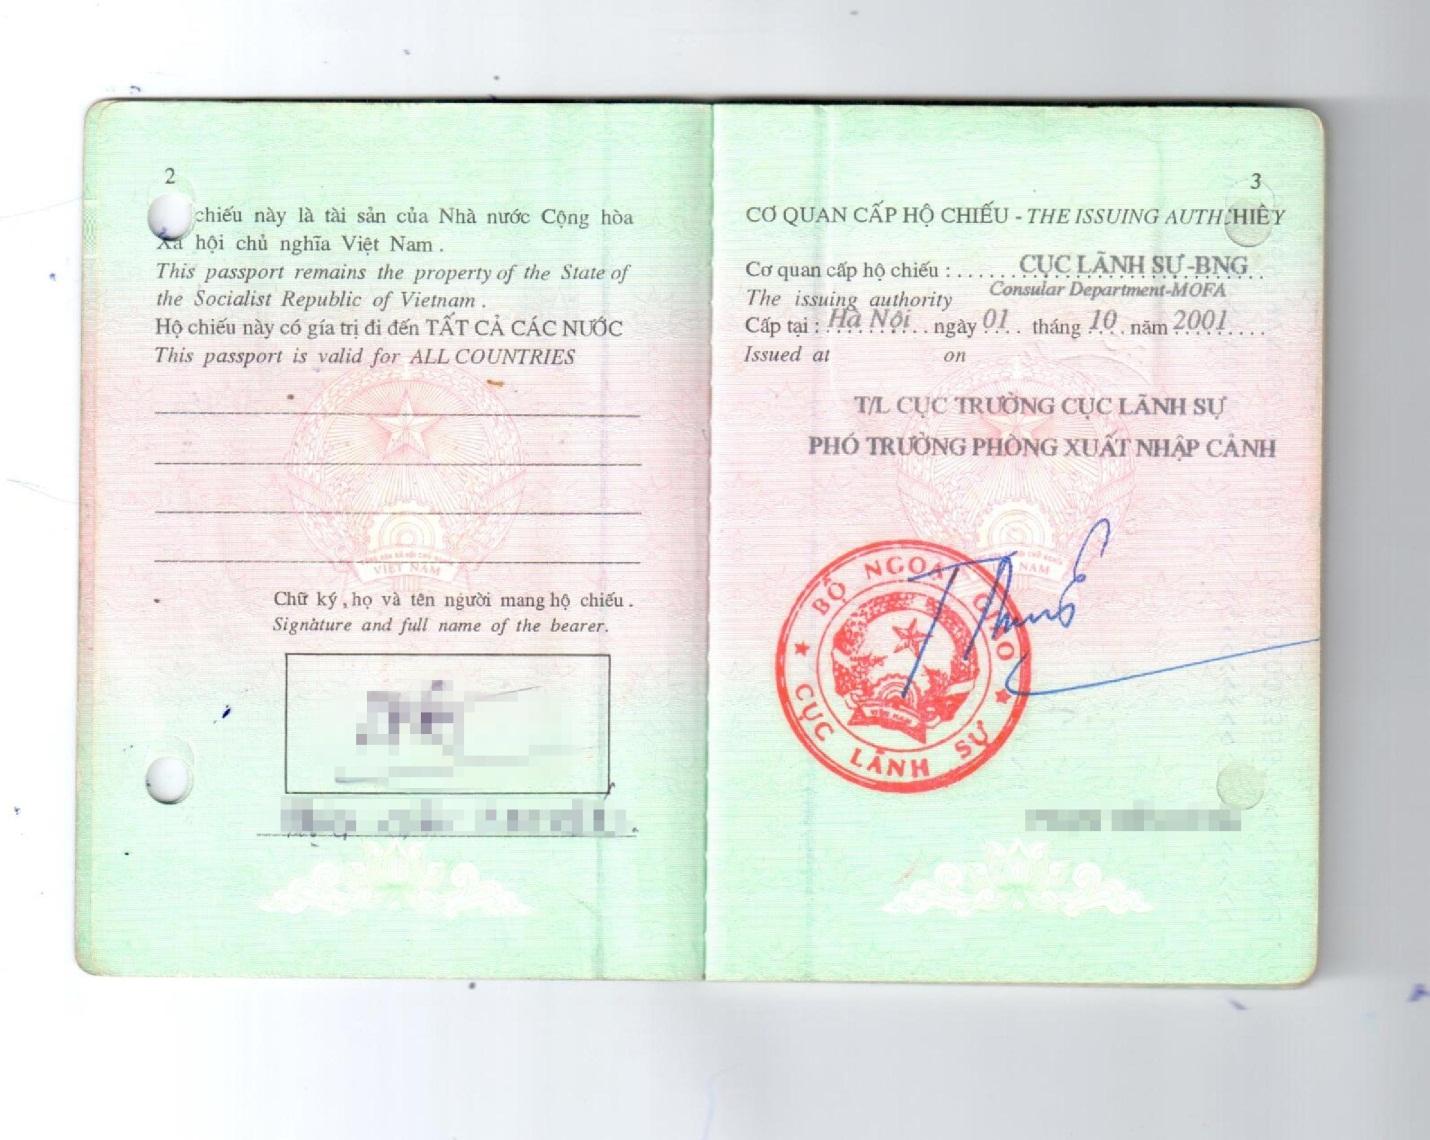 ho-so-lam-lai-ho-chieu-con-han-duoi-6-thang-visabaongoc.com-001